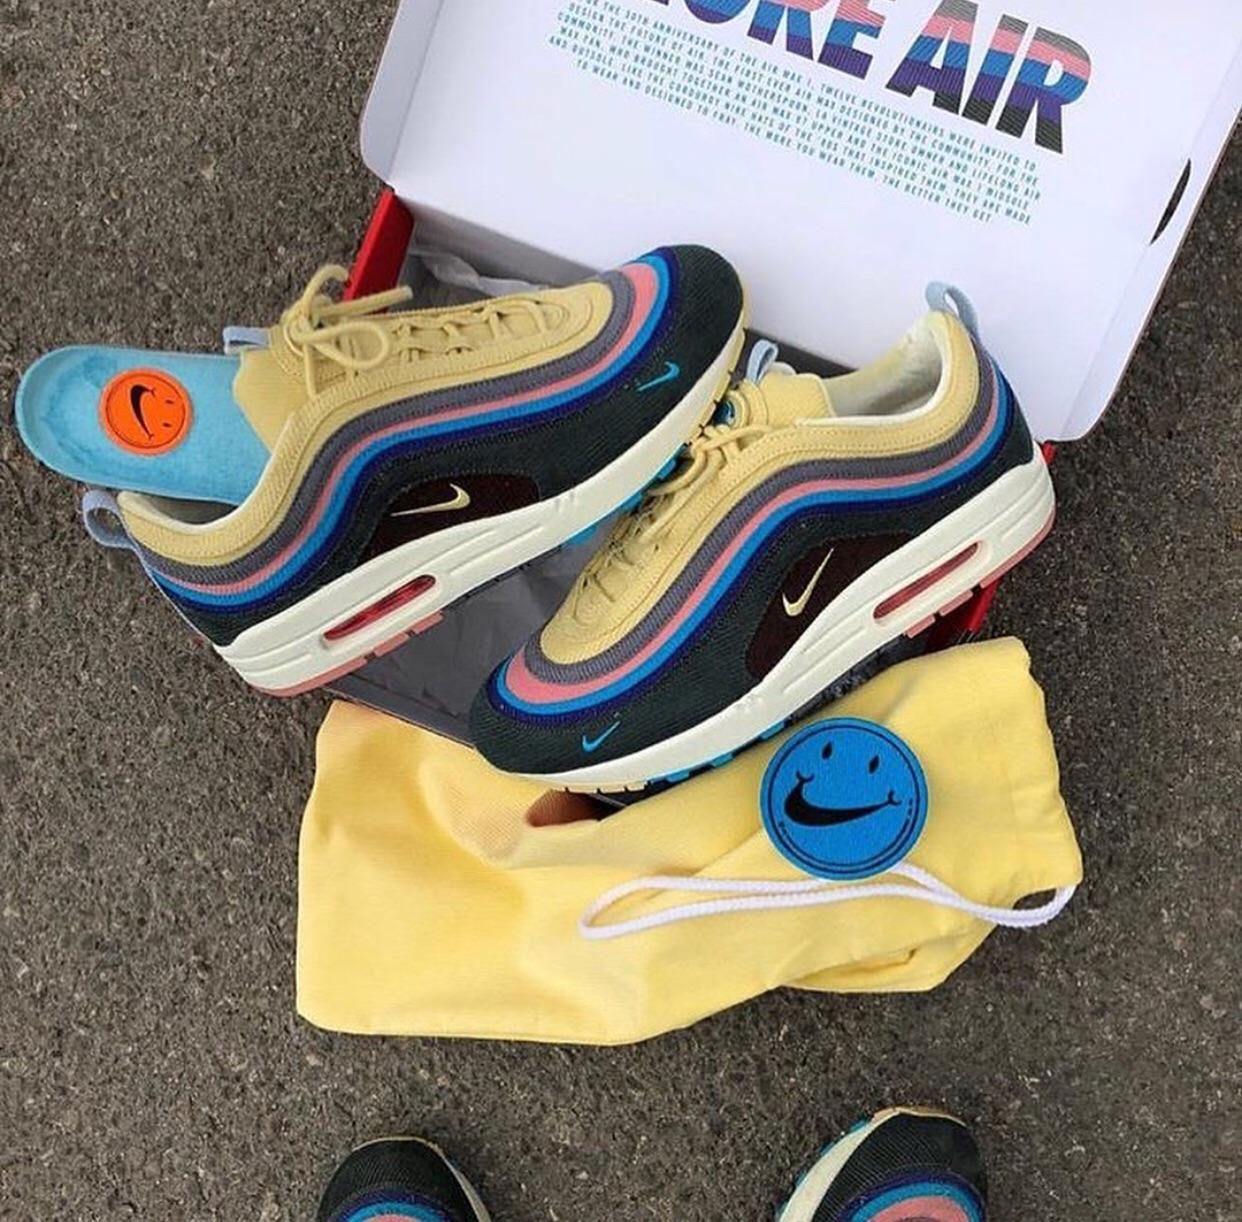 Sean weatherspoon x nike http   ift.tt 2hTcuN3 Neue Sneaker 579a8c98d17